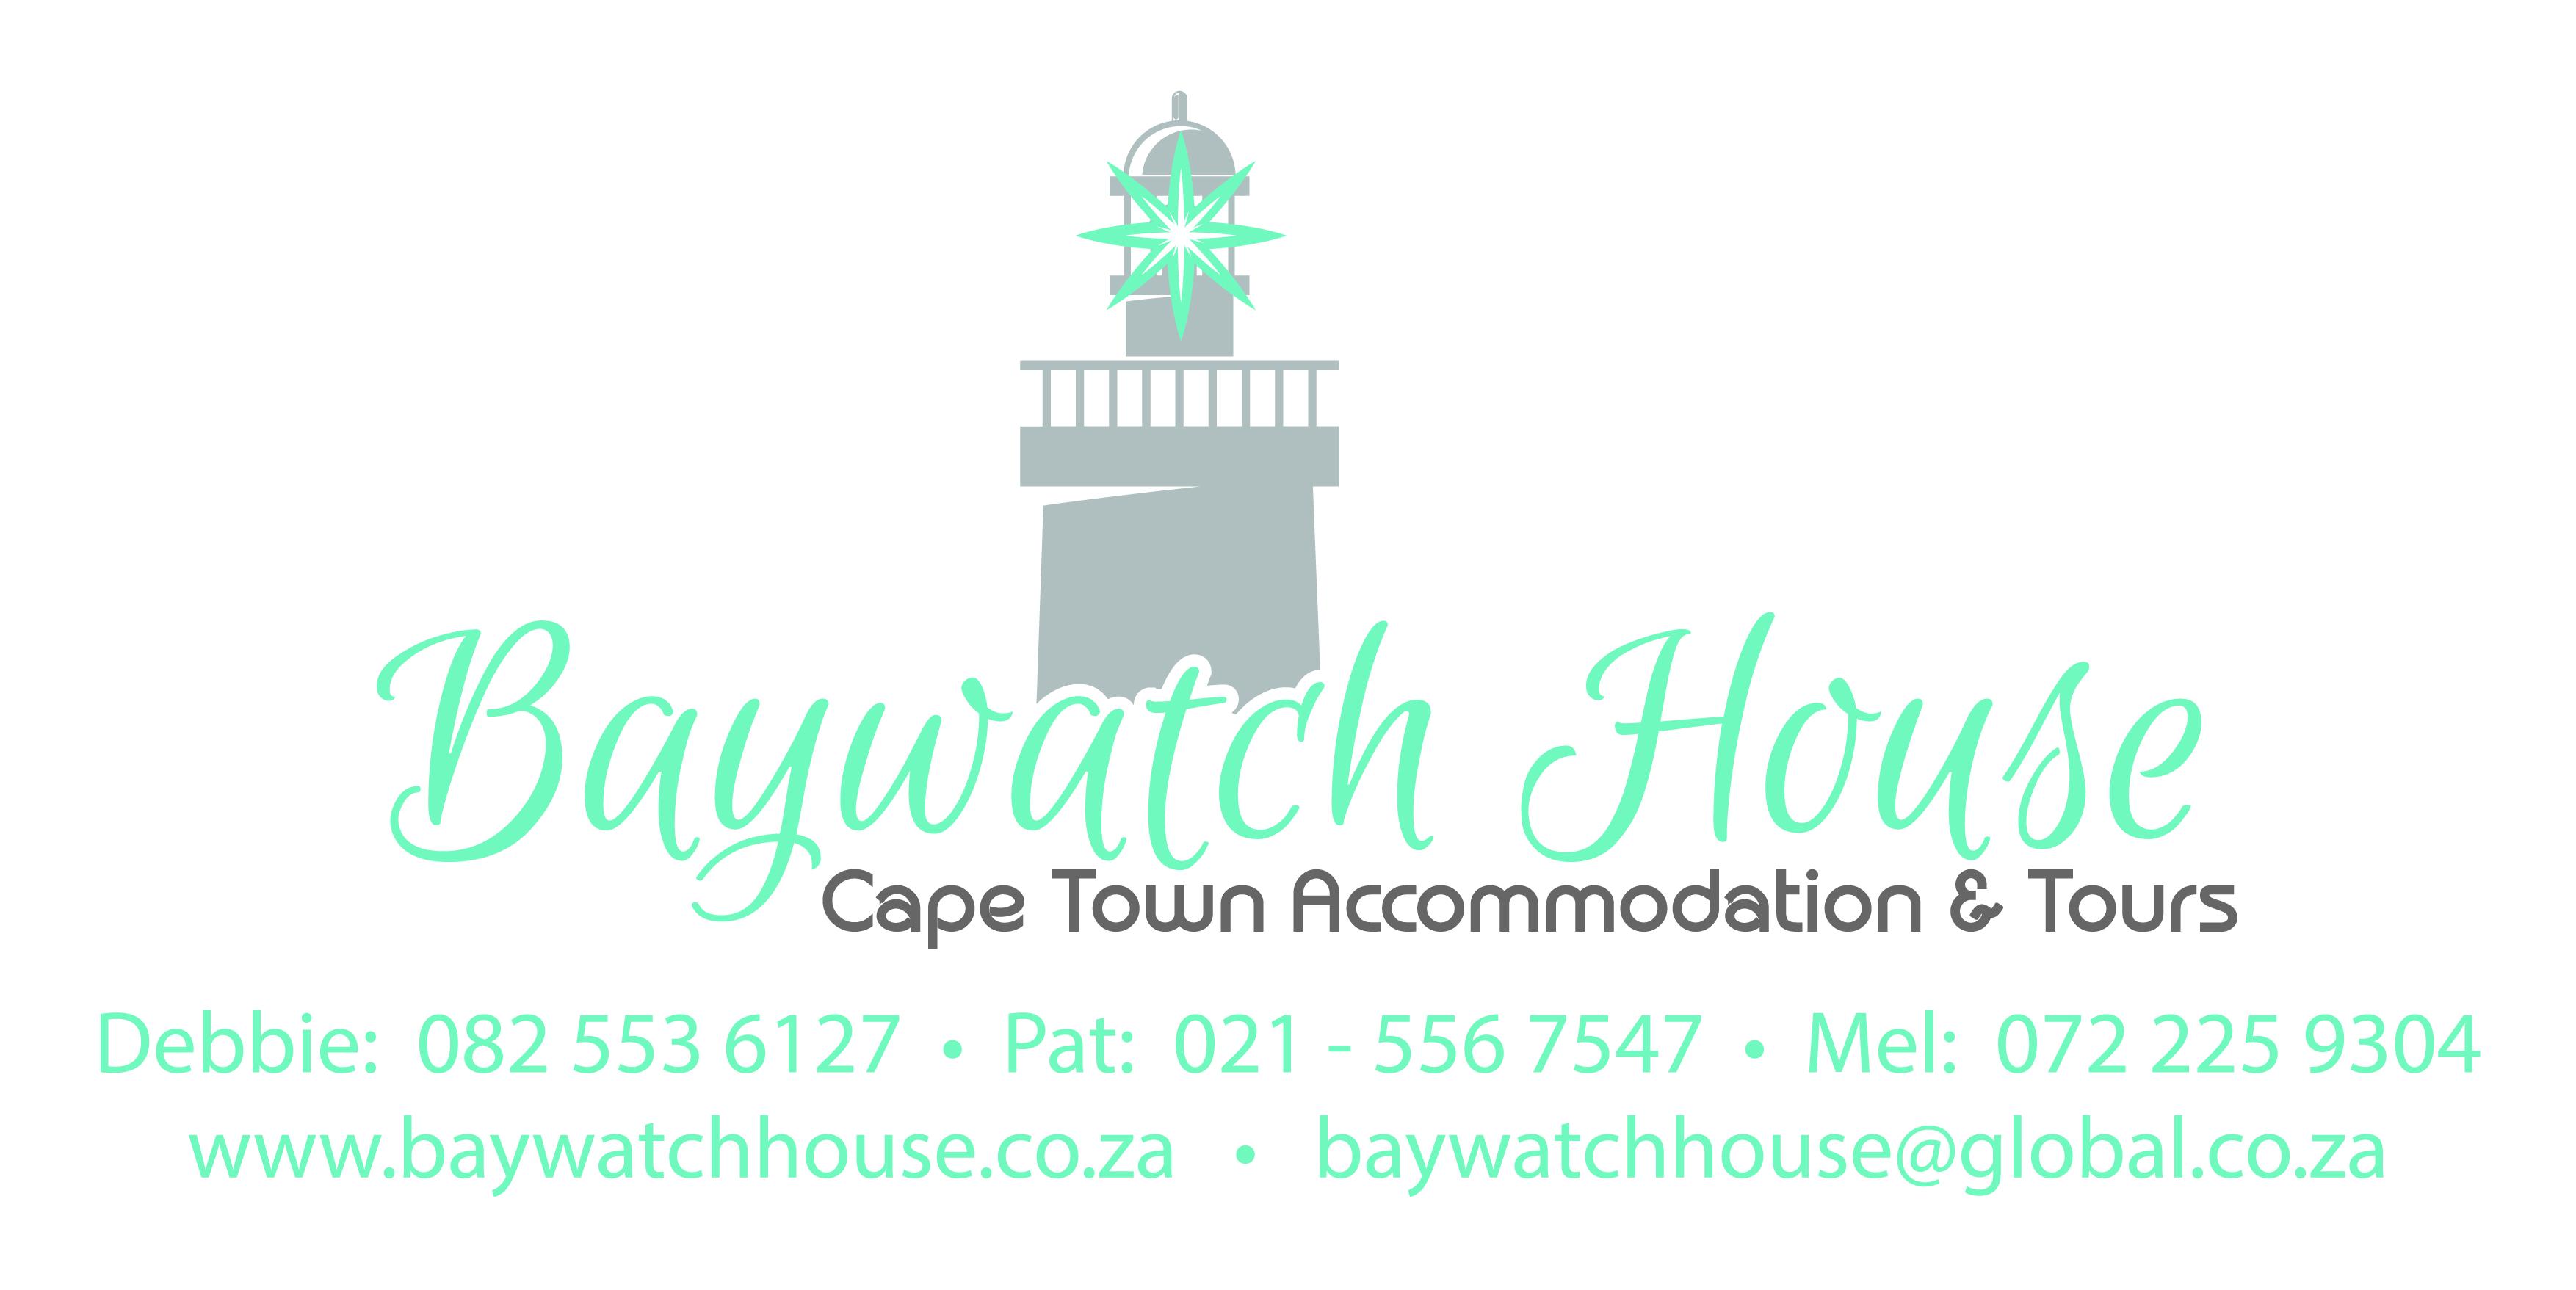 Baywatch House